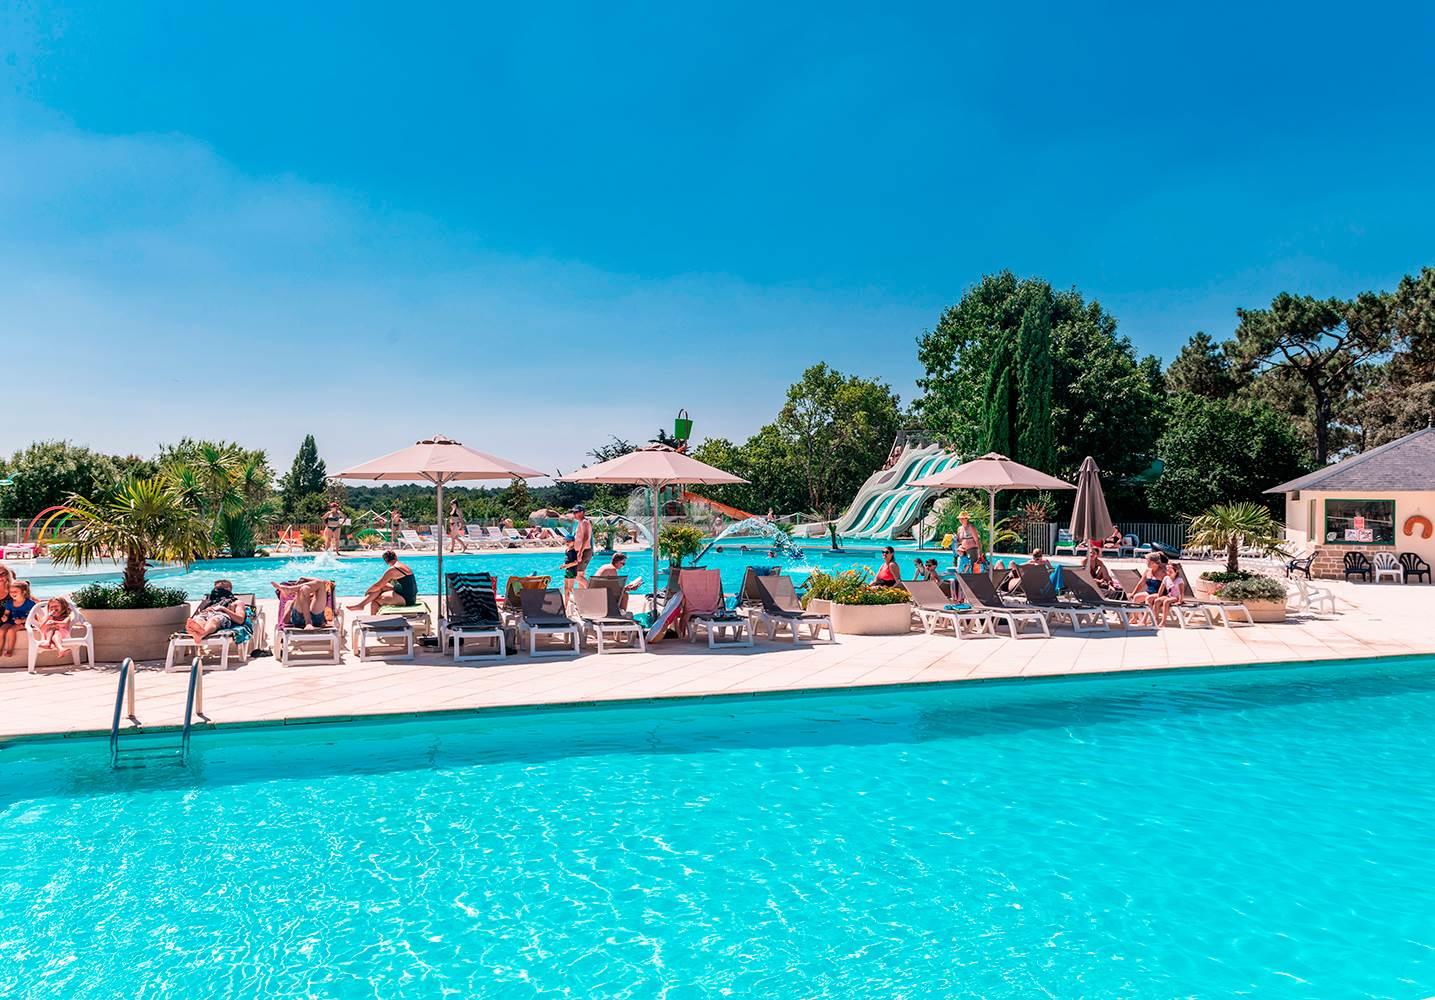 Le bassin de natation ©